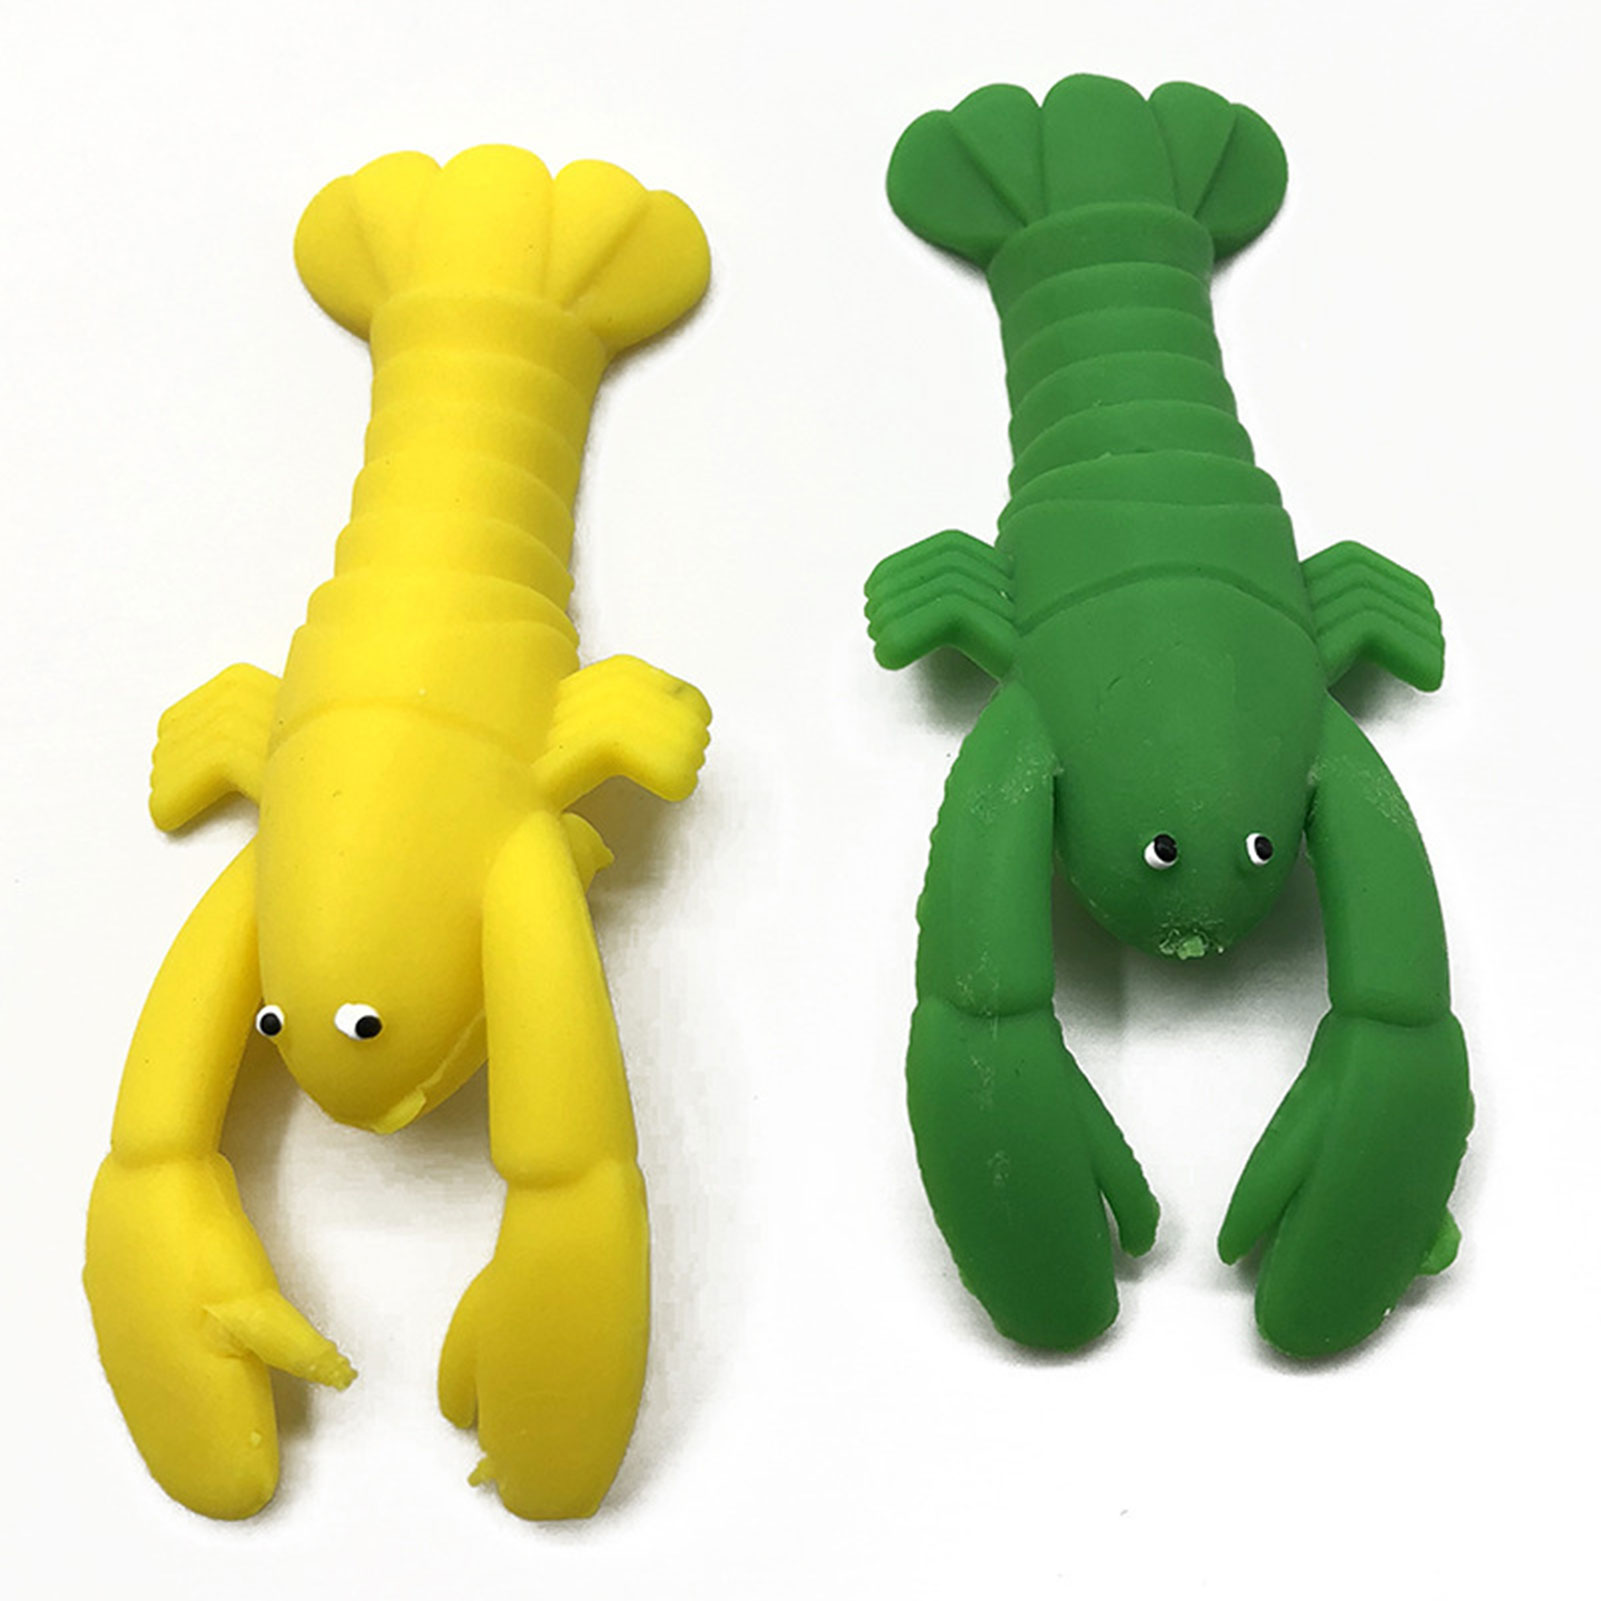 25 Pcs Sensory Fidget Toy Set Plastic Noodles Ropes Pinch Bear Dinosaur Stress Relief Hand Toys For Kids Adults enlarge